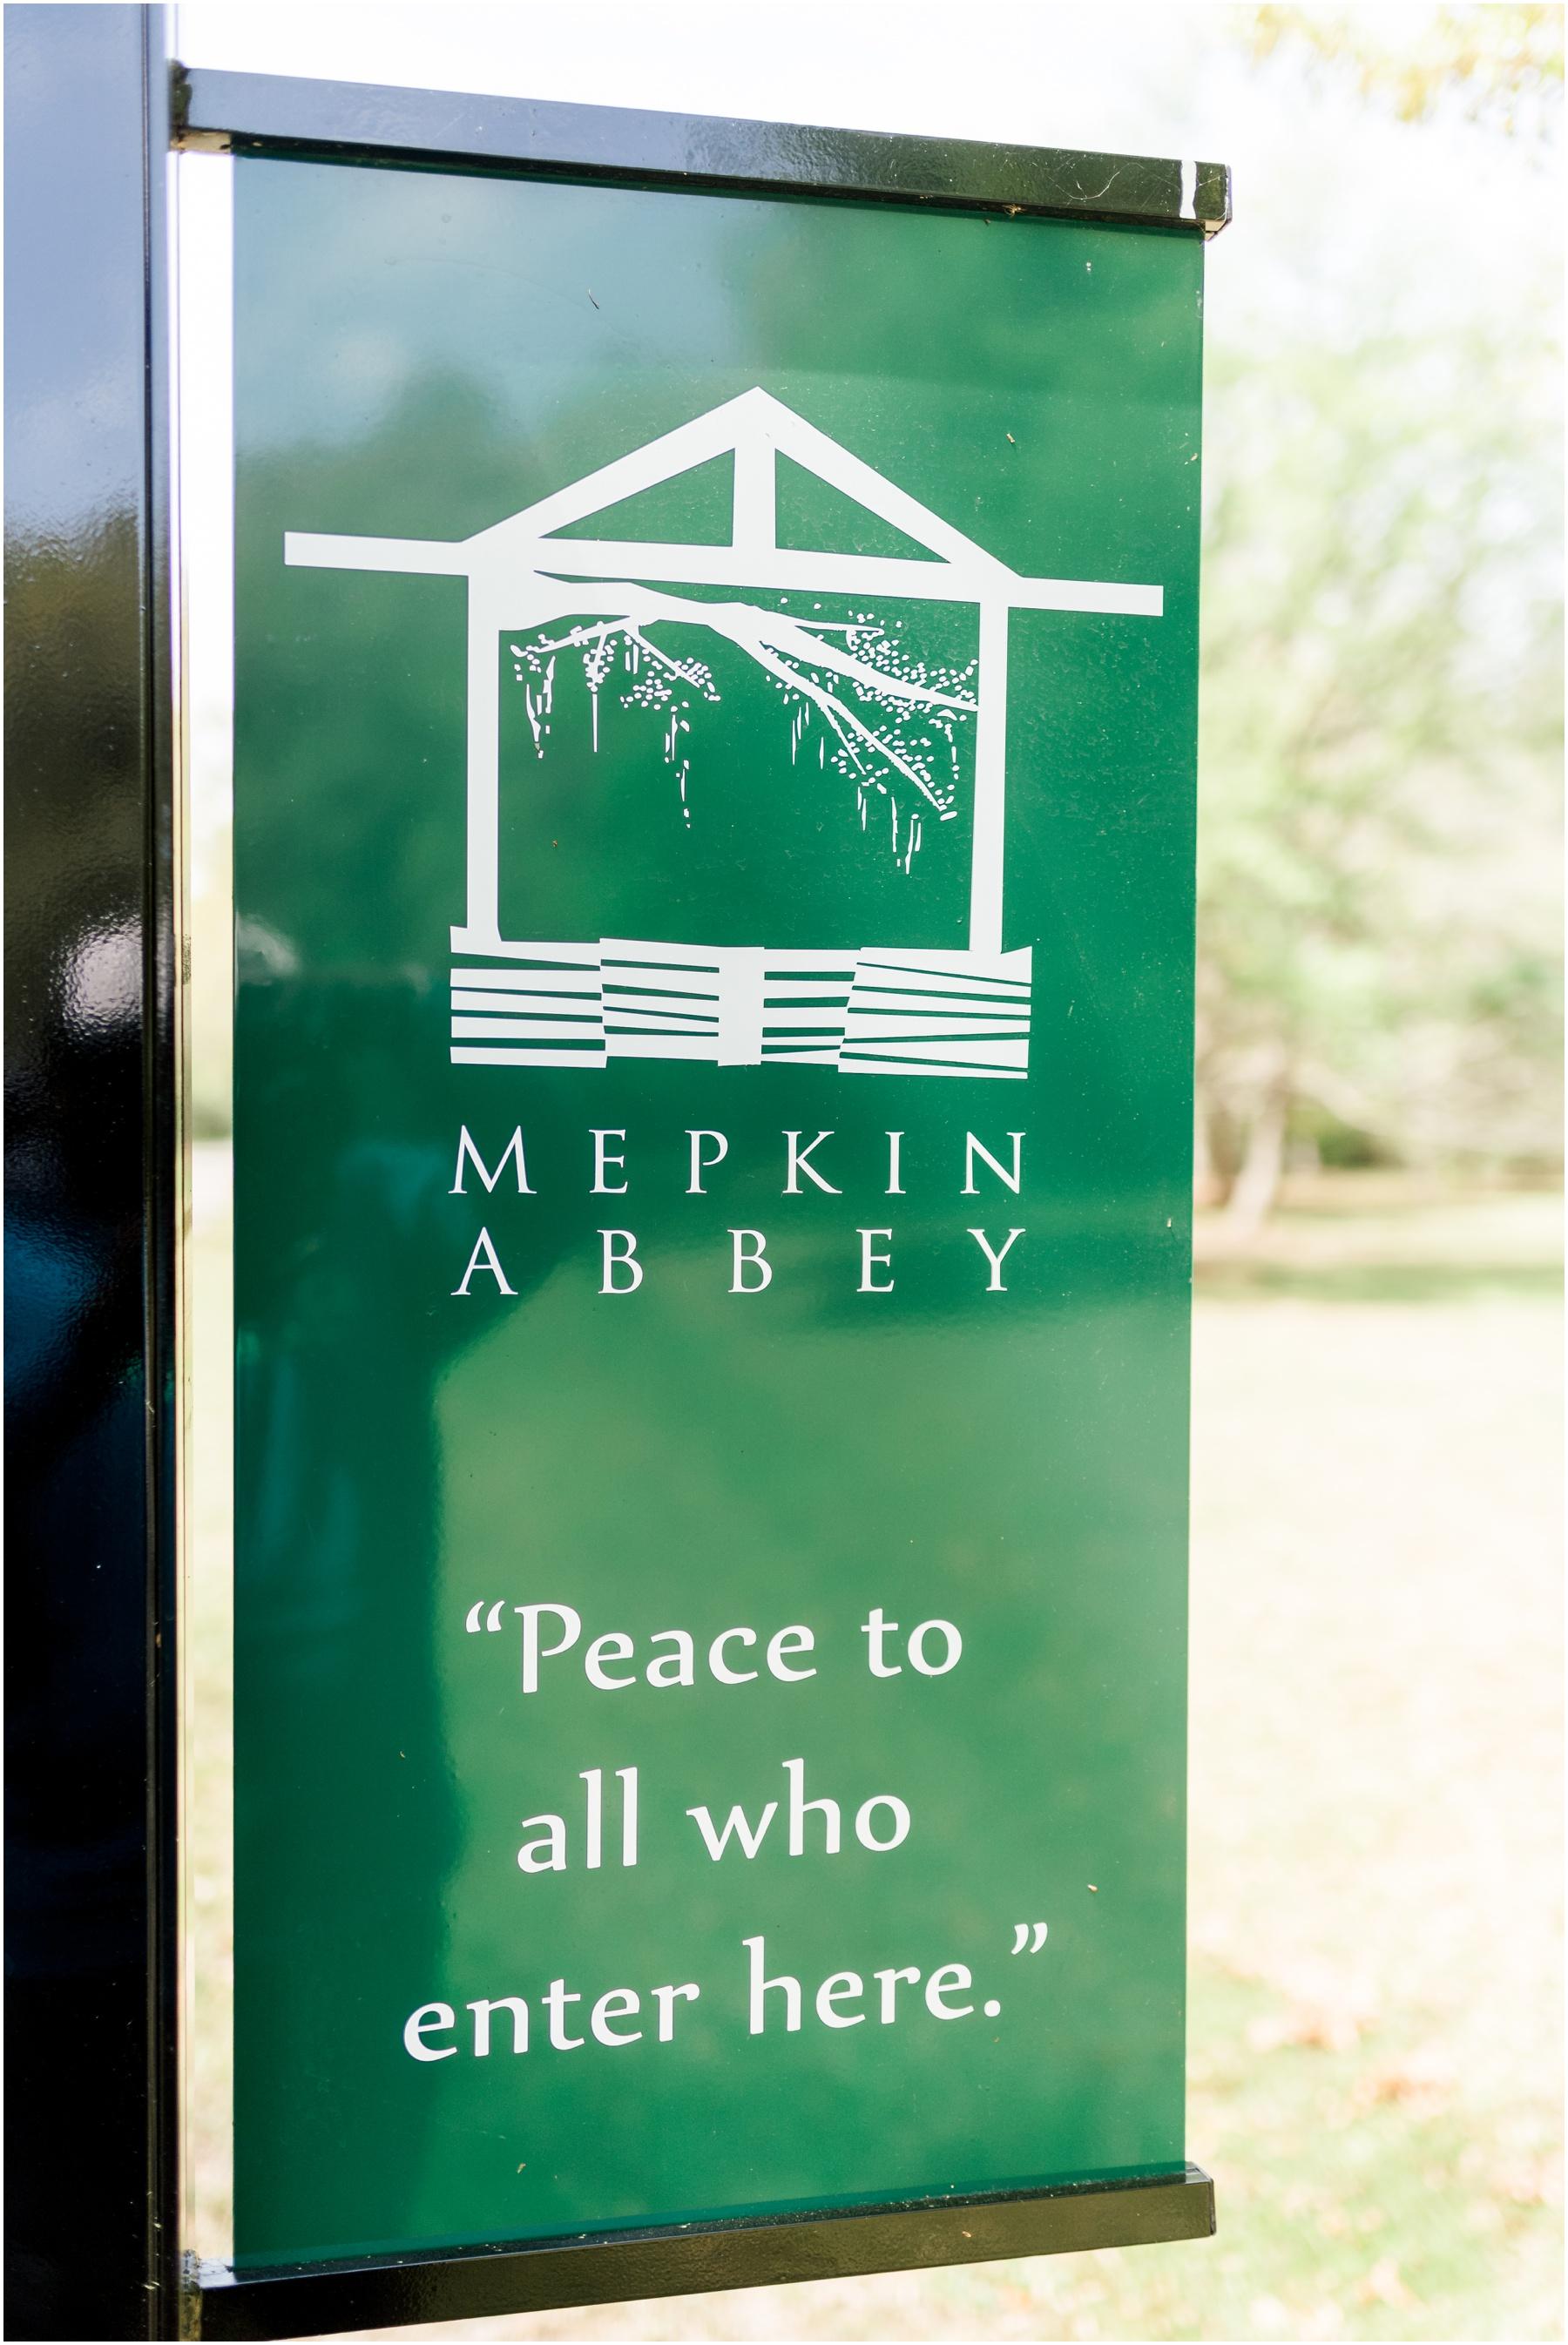 Mepkin-Abbey-Moncks-Corner-South-Carolina-Engagement-Session-Photos_0025.jpg